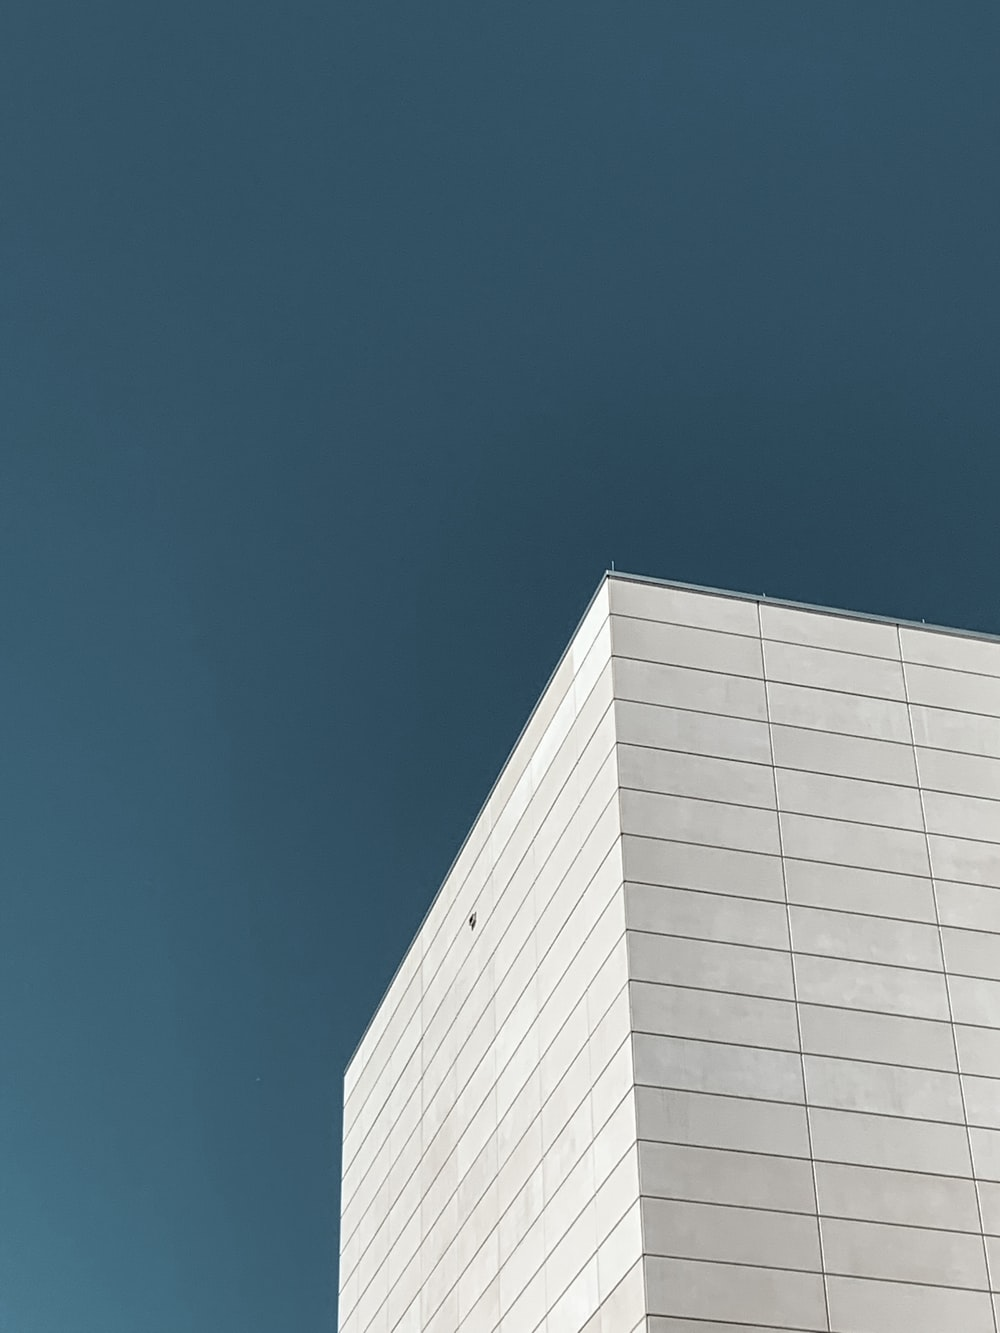 white building across sky